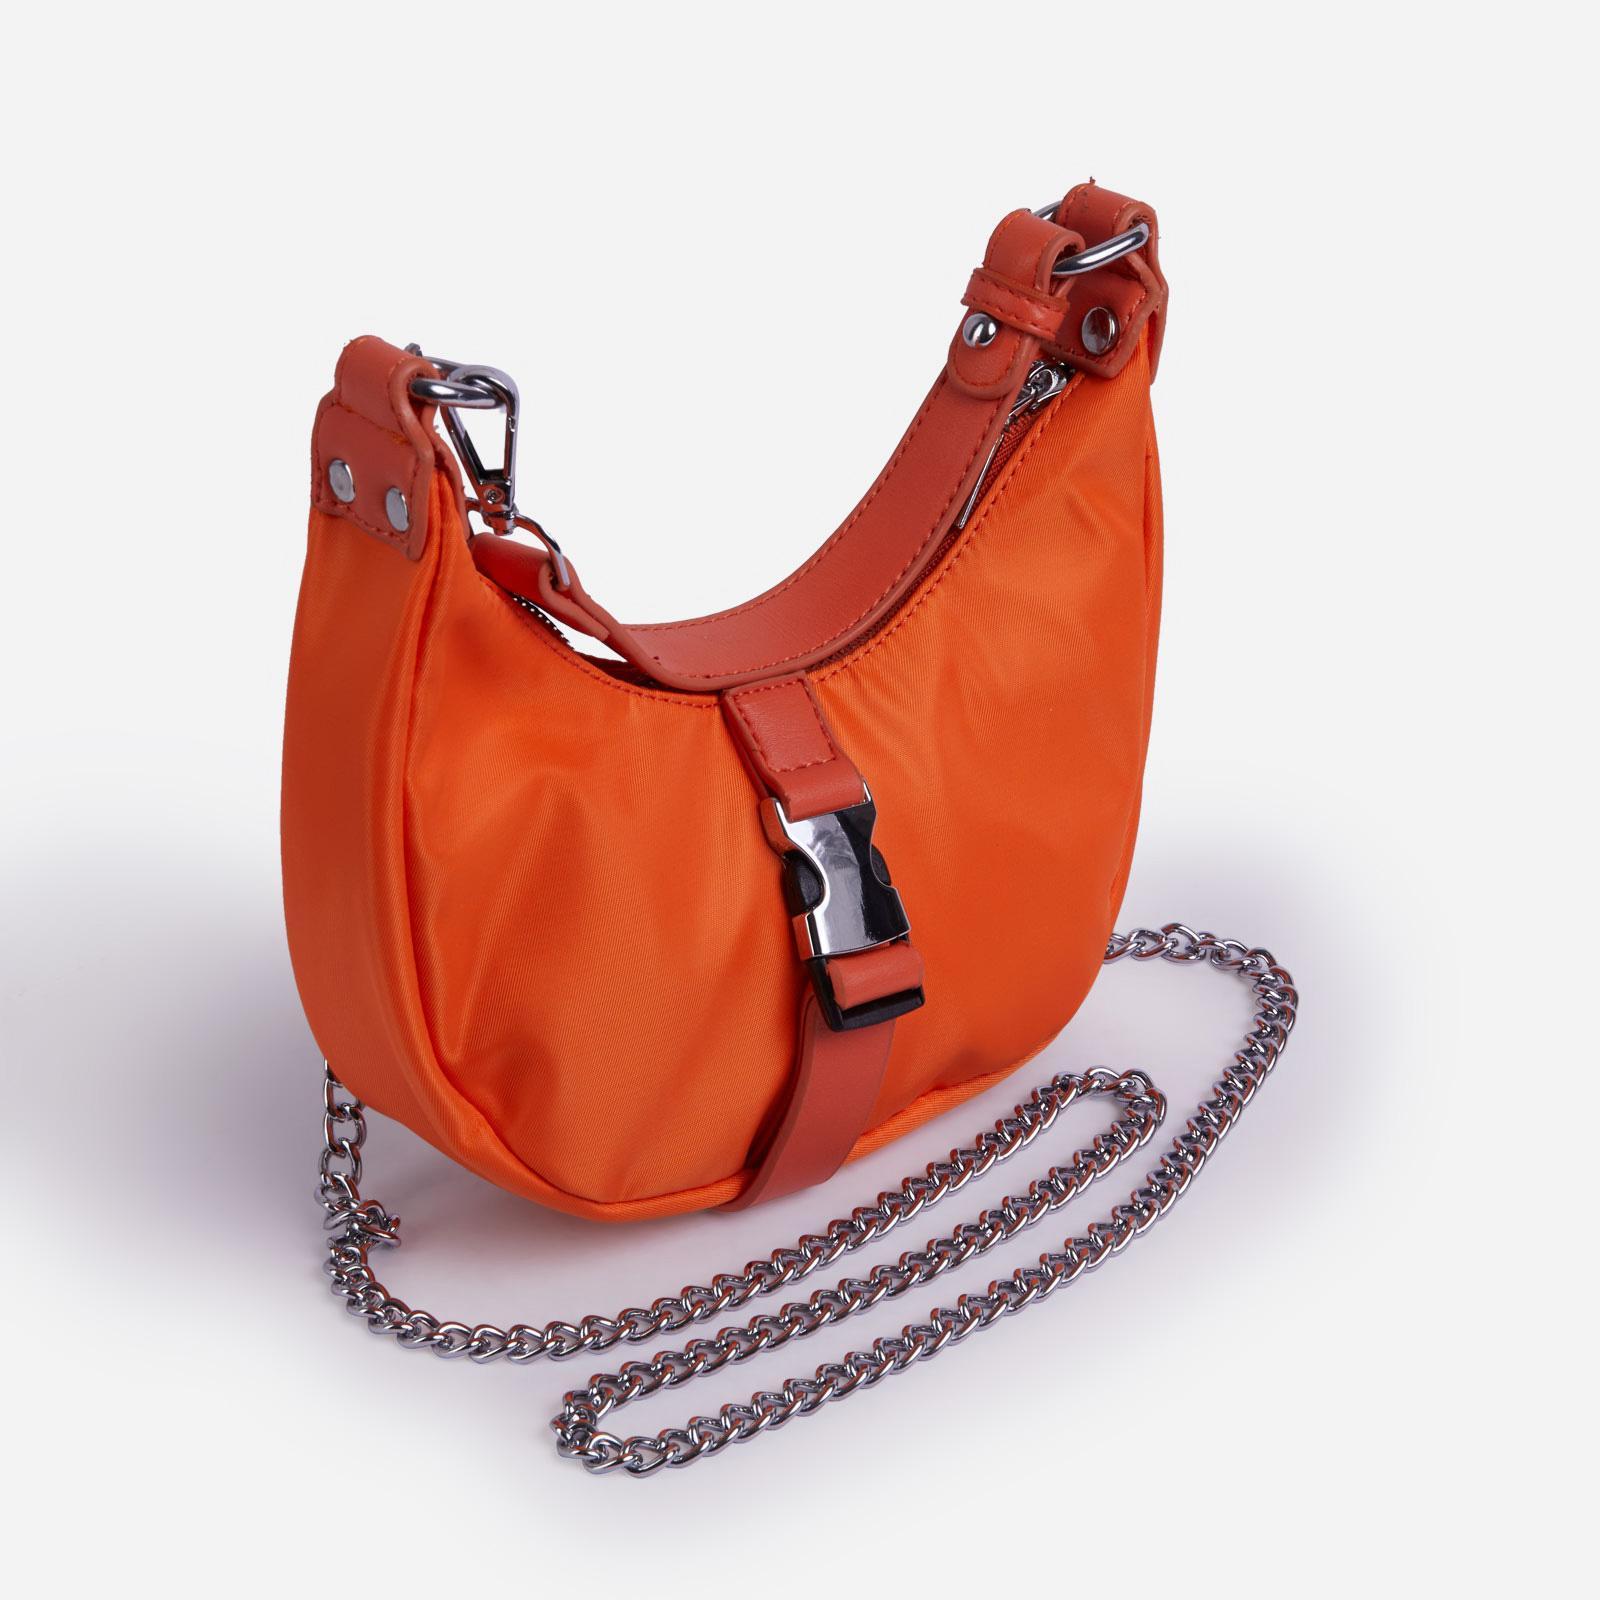 EGO Cyrus Buckle & Chain Detail Shoulder Bag in Orange Nylon,, Orange  - female - Size: One Size